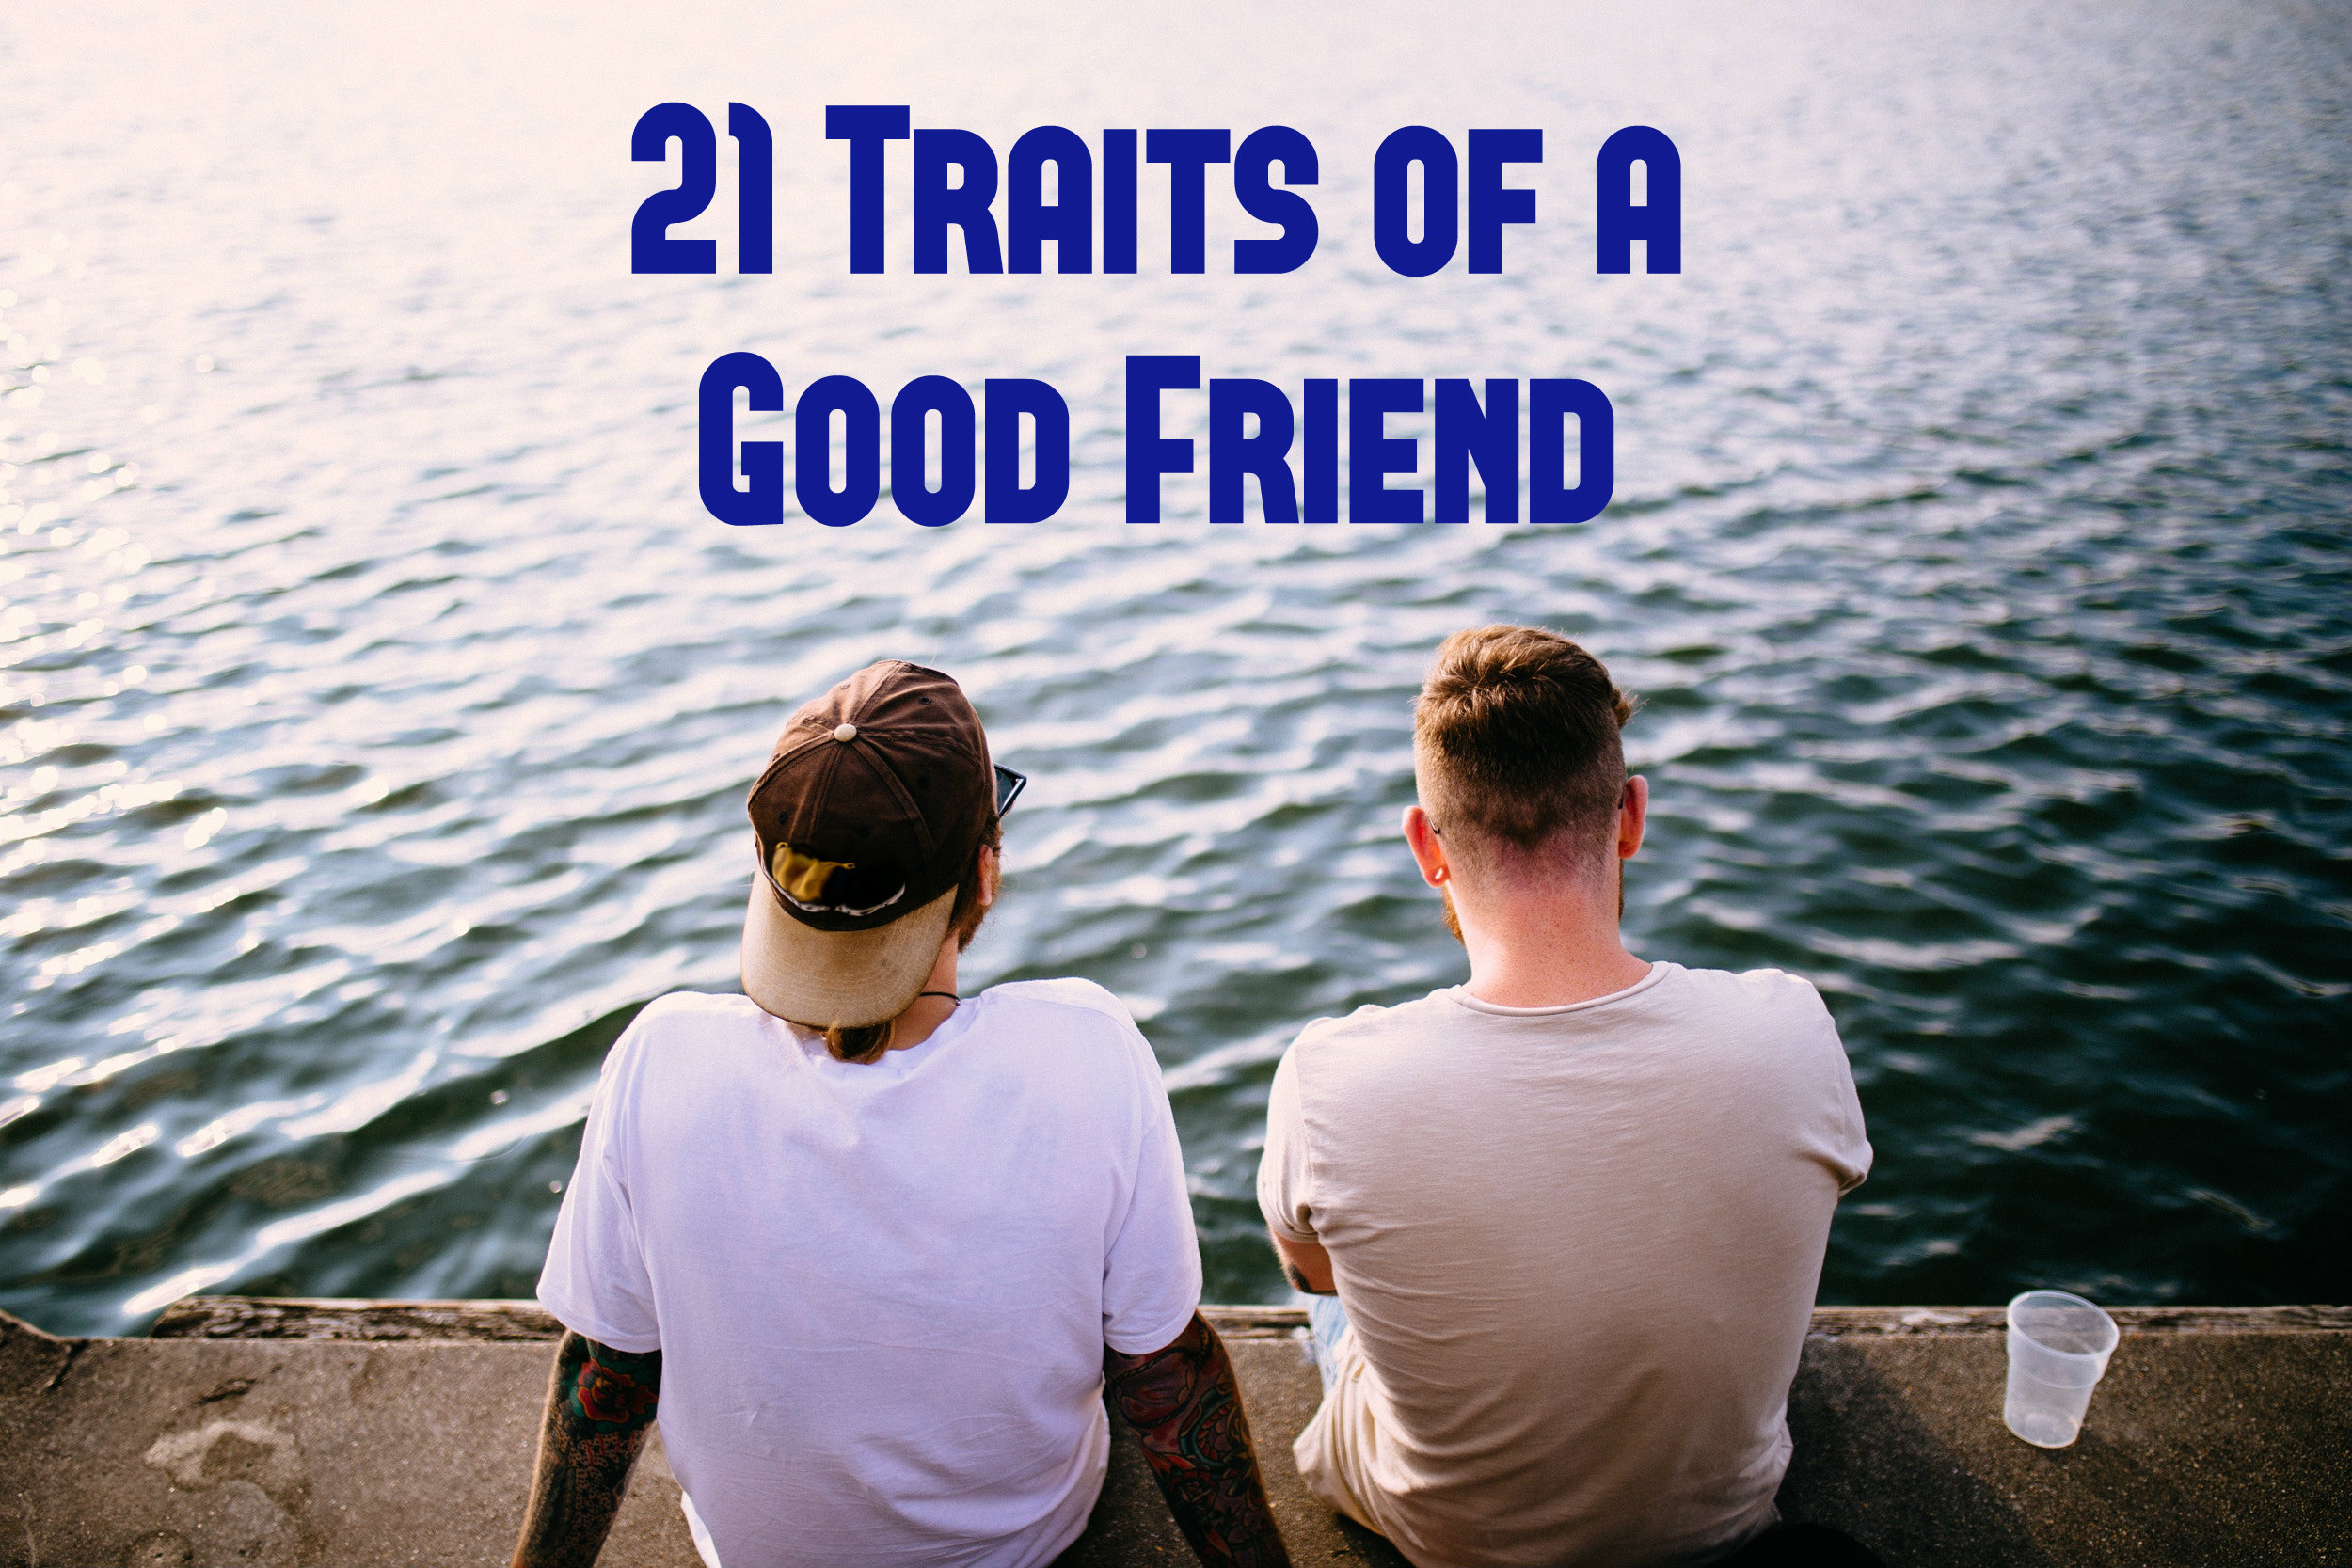 21 Traits Of A Good Friend